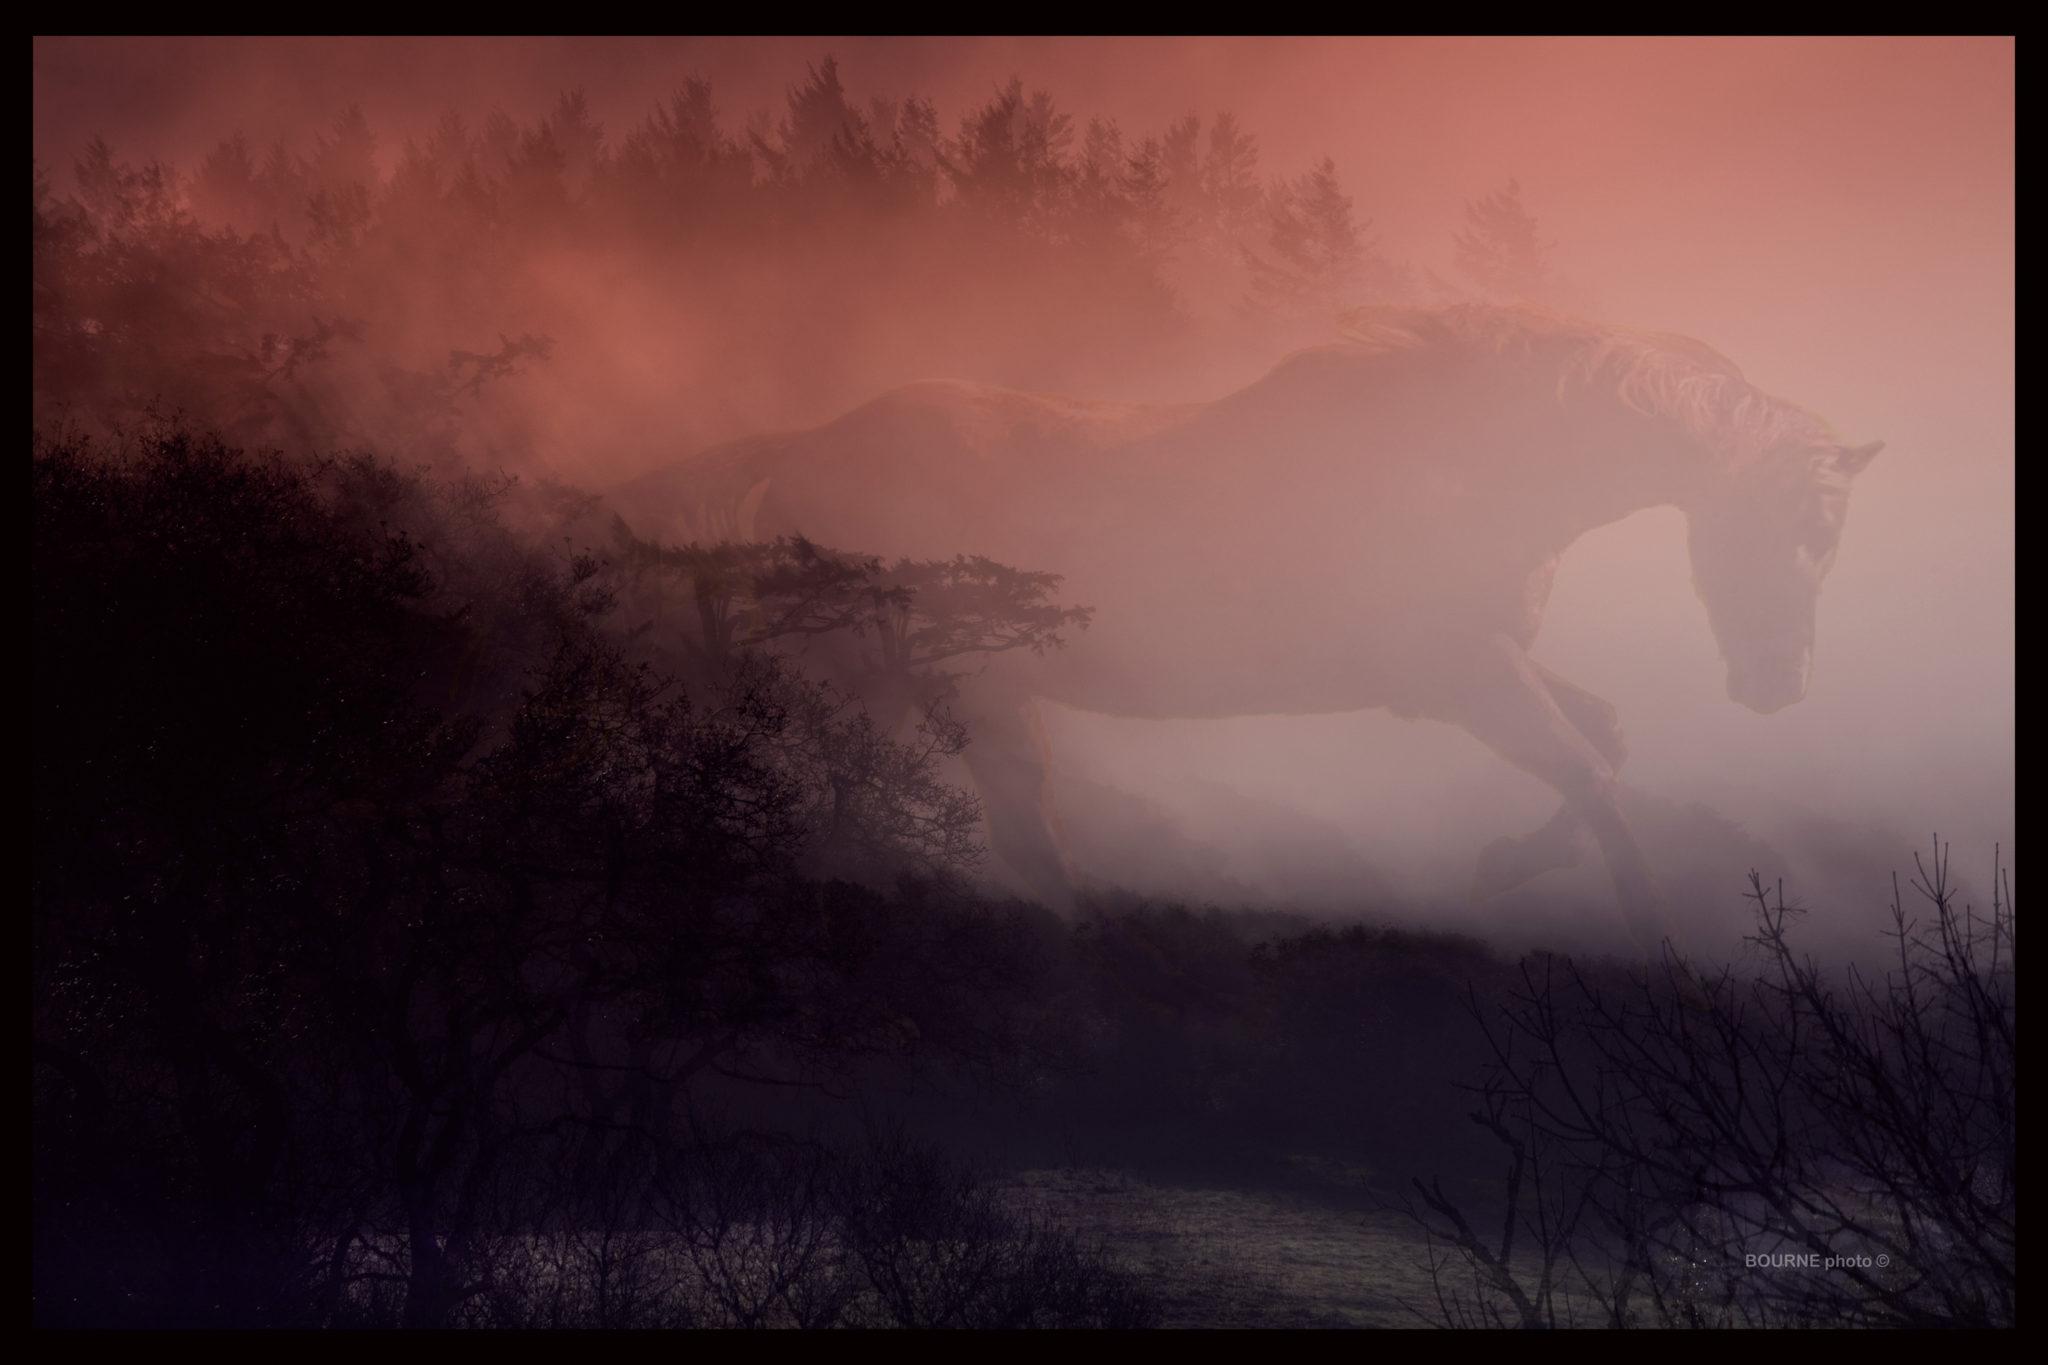 Graceful Horse emerging through mist